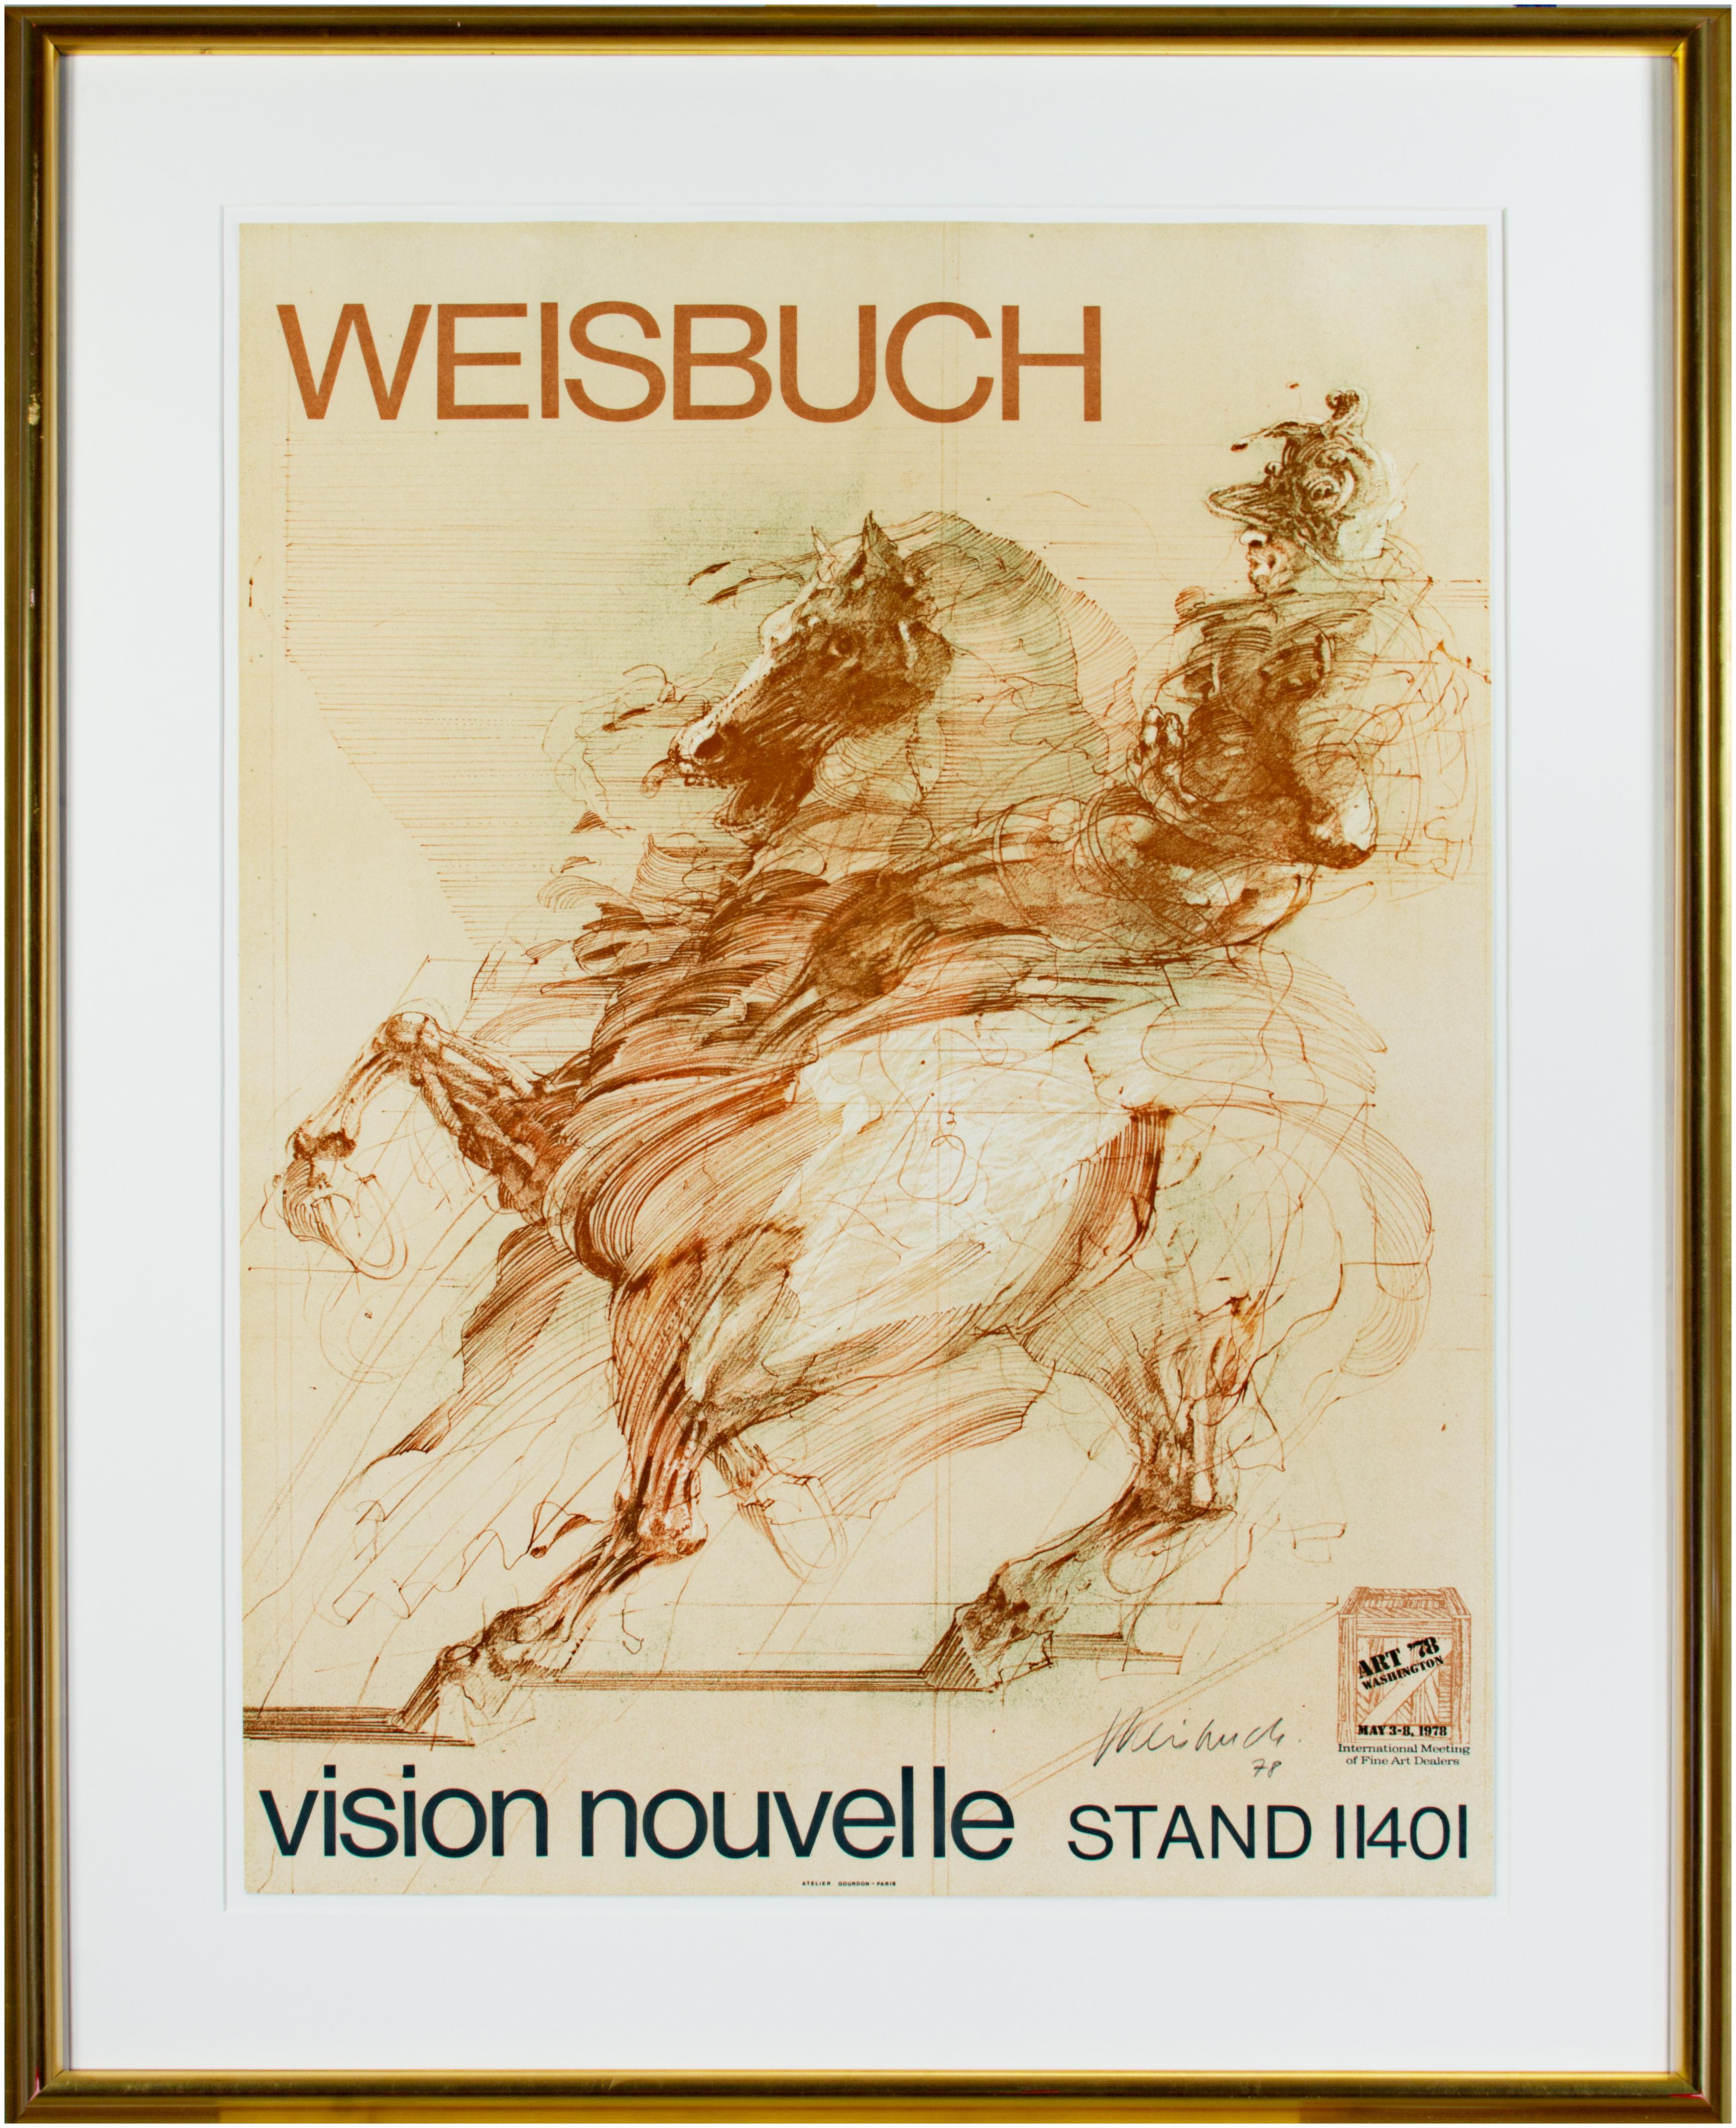 'Le Condottiere' original signed lithograph poster, knight on horseback 1970s